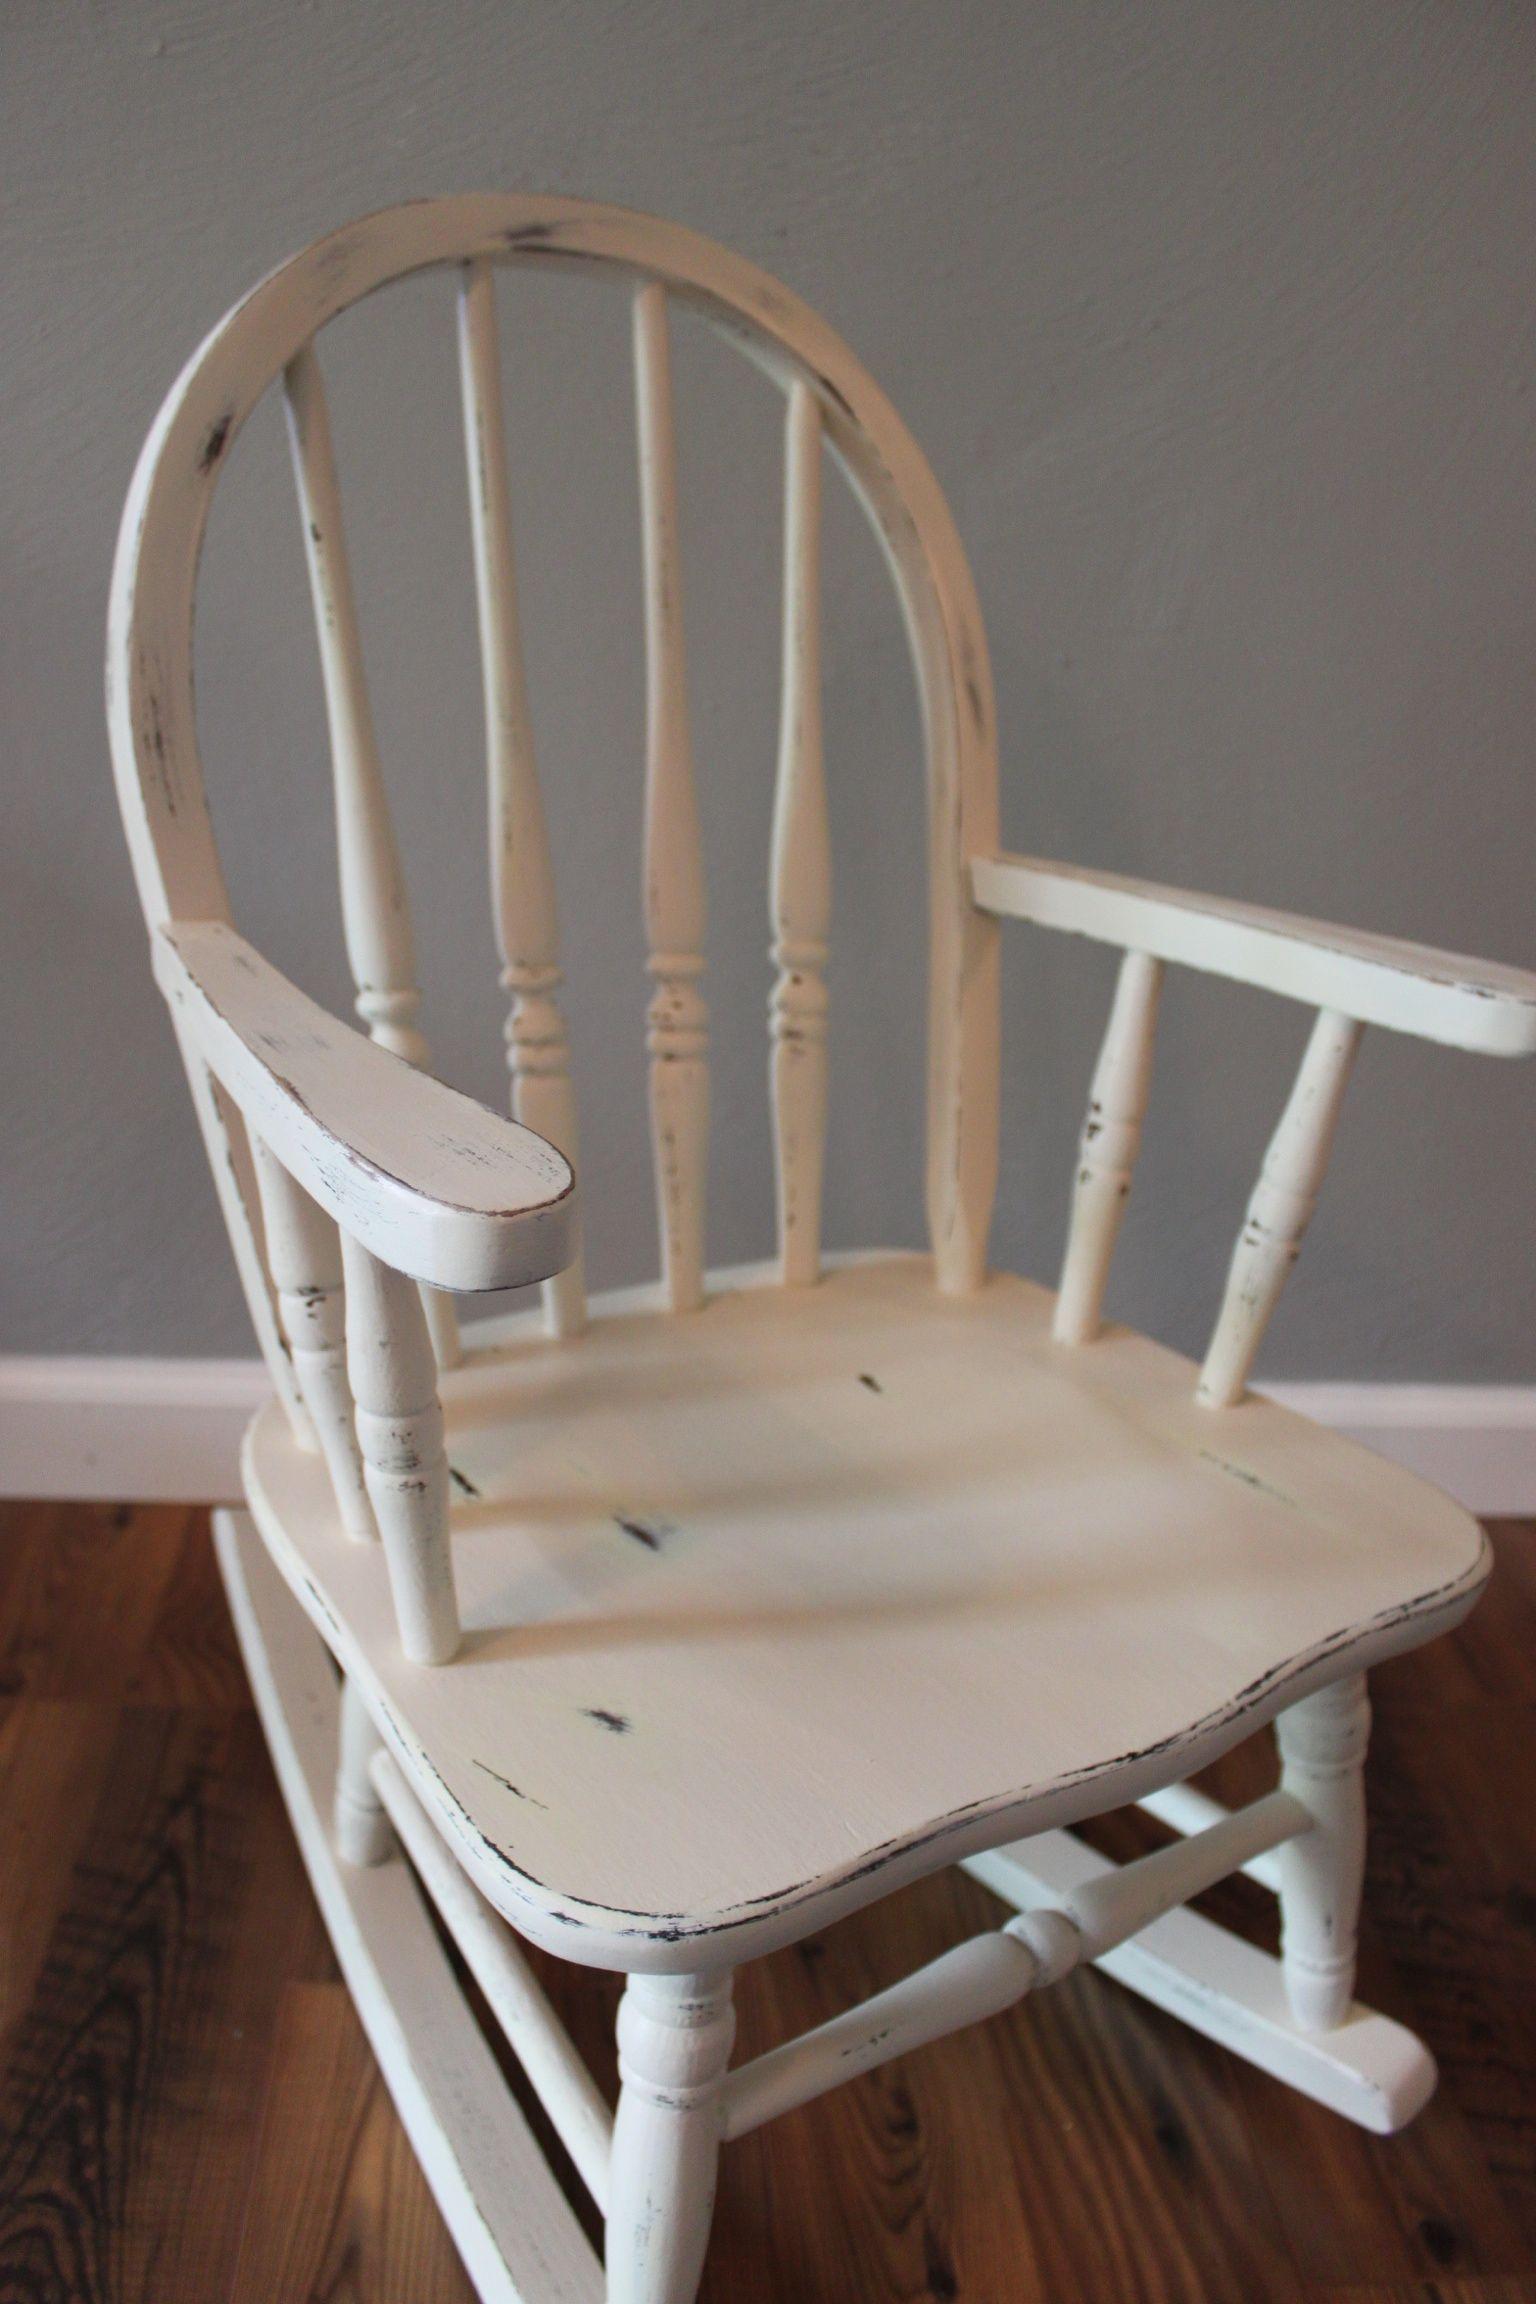 Antique white distressed children's rocking chair - Antique White Distressed Children's Rocking Chair Distressed